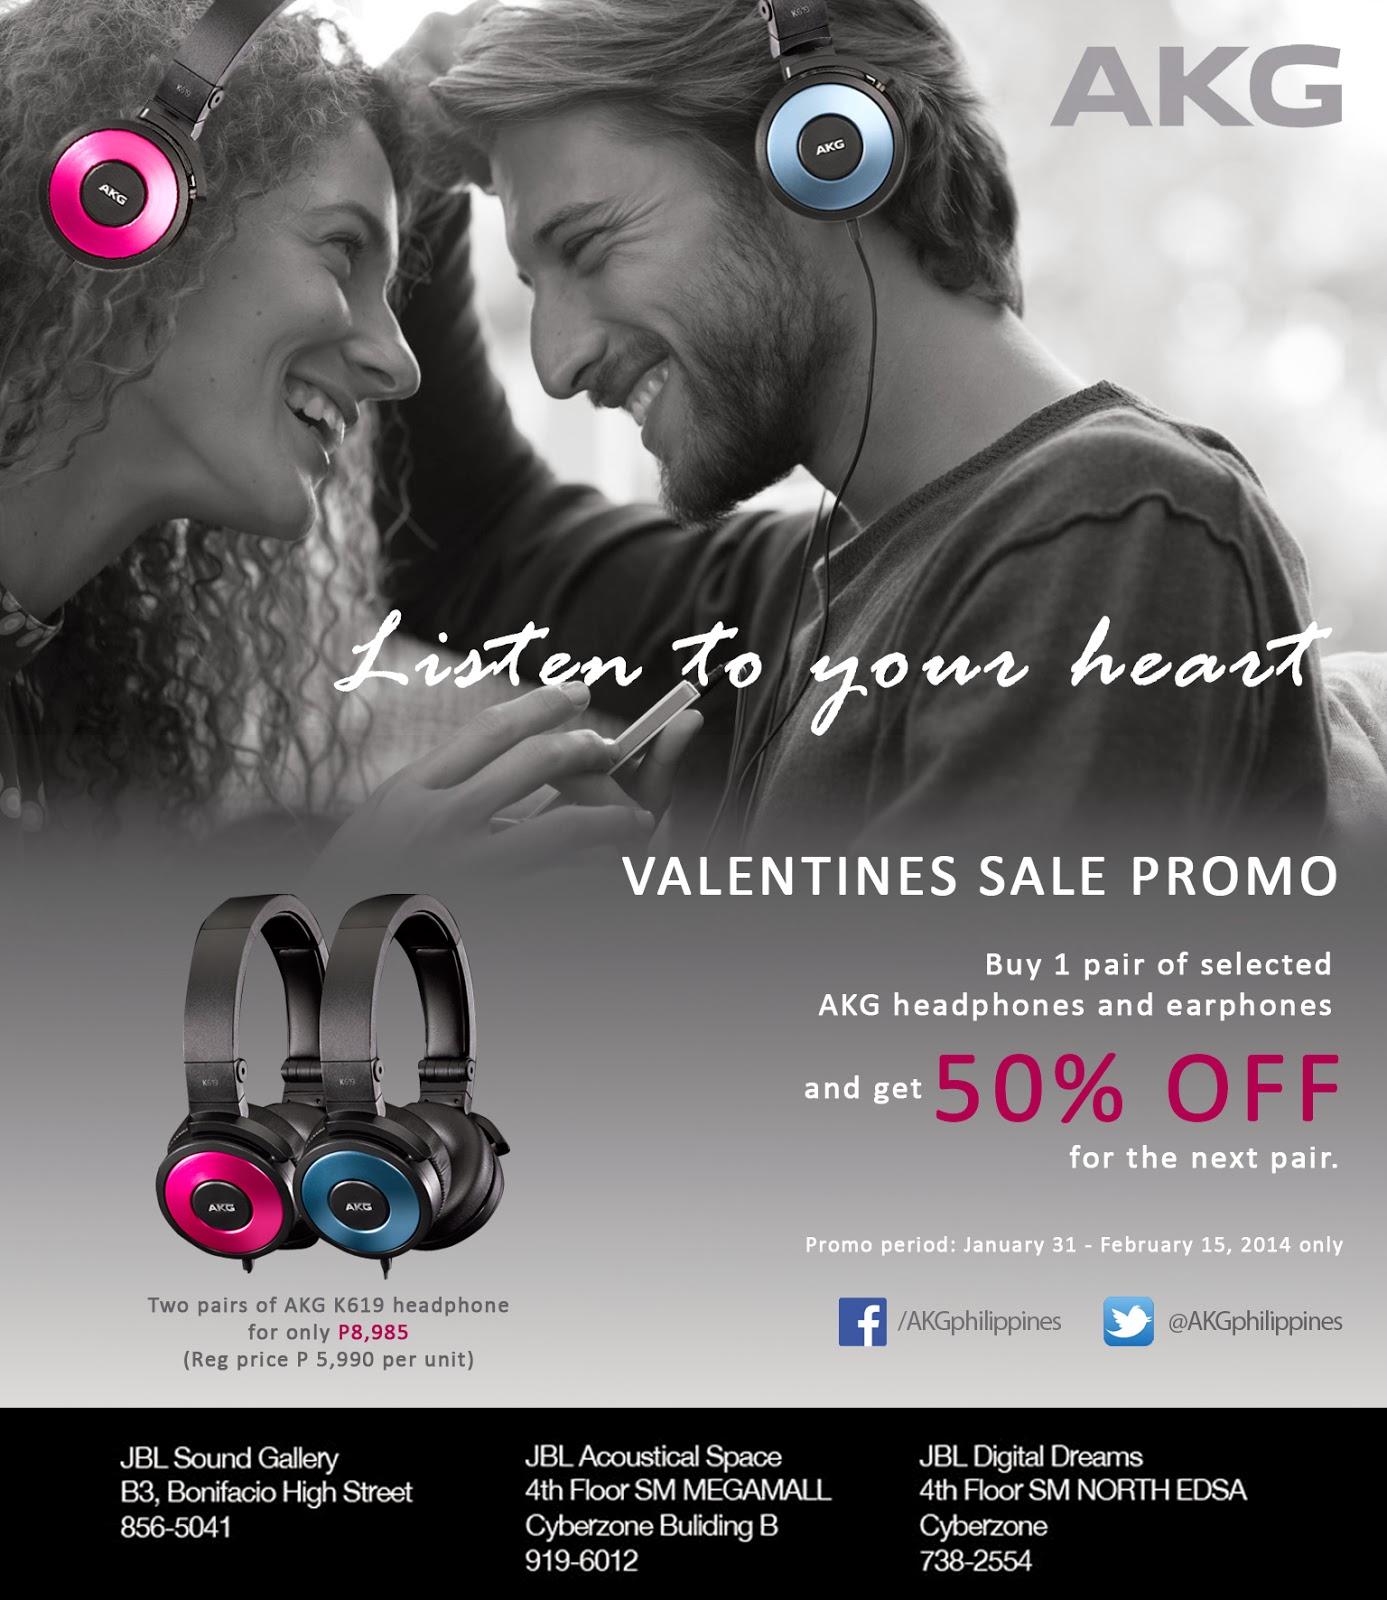 akg valentines day sale promo 2014